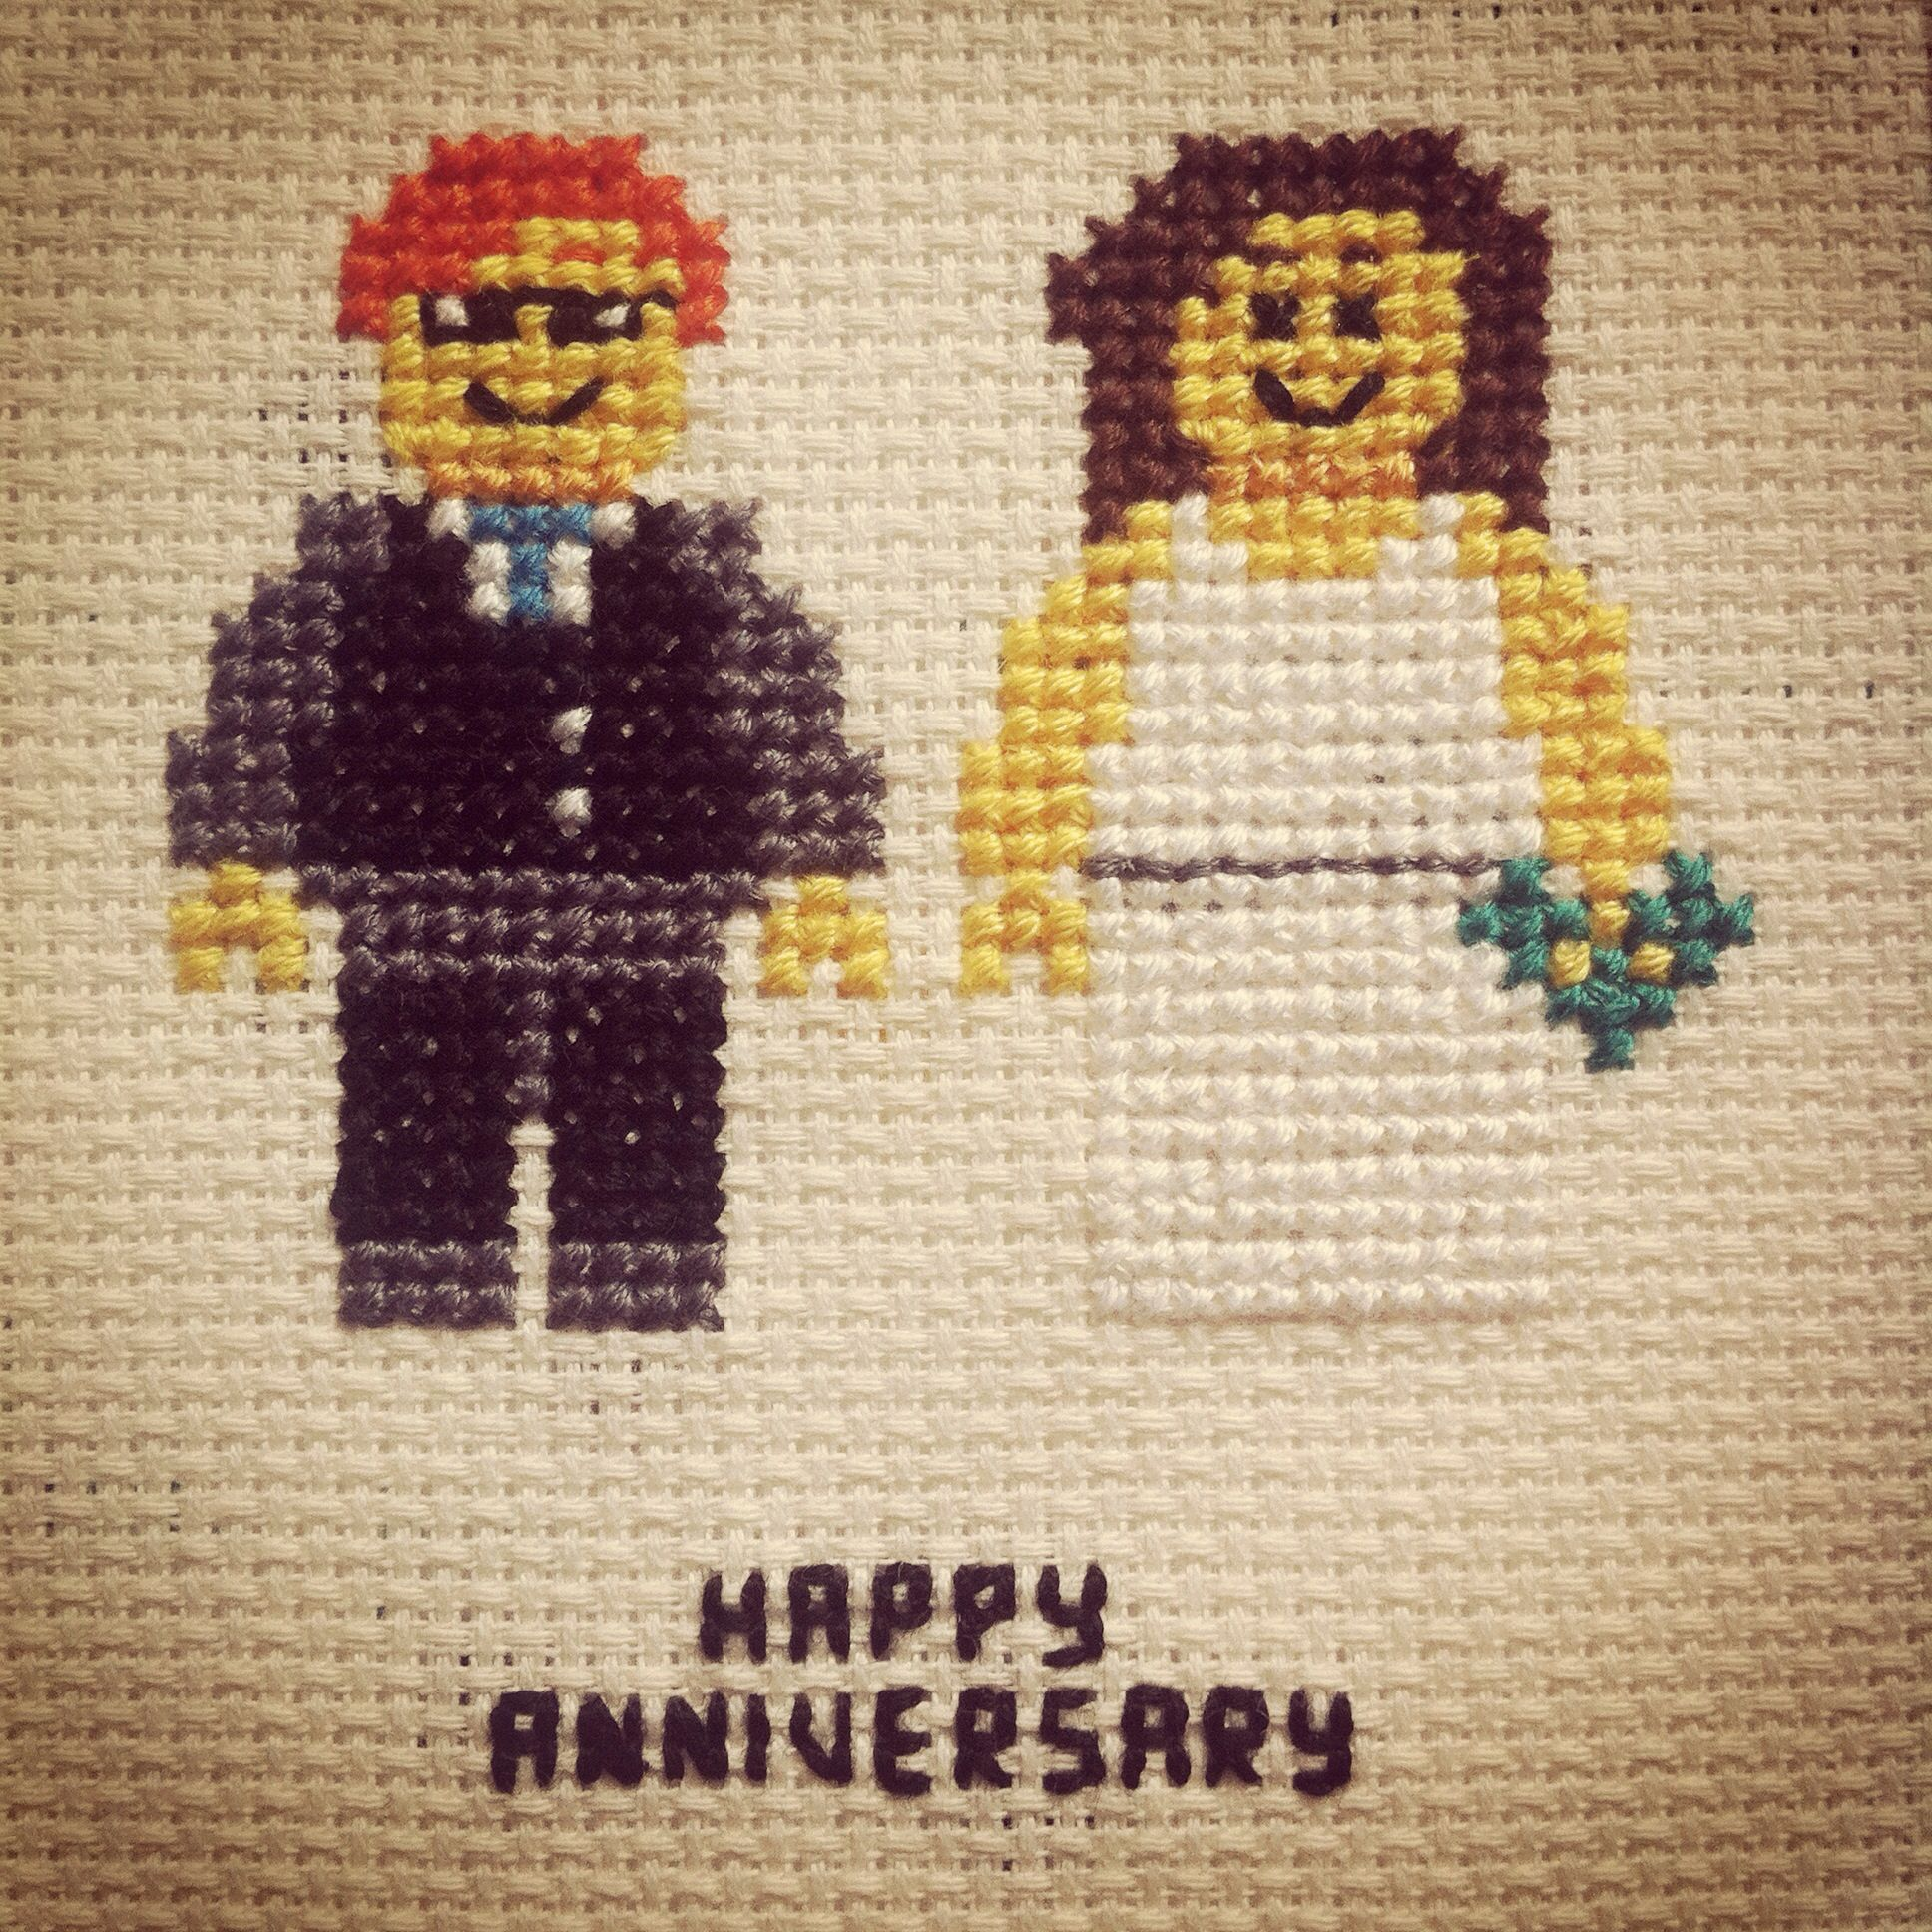 2nd Wedding Anniversary (Cotton) - Lego Cross Stitch Artwork Gift